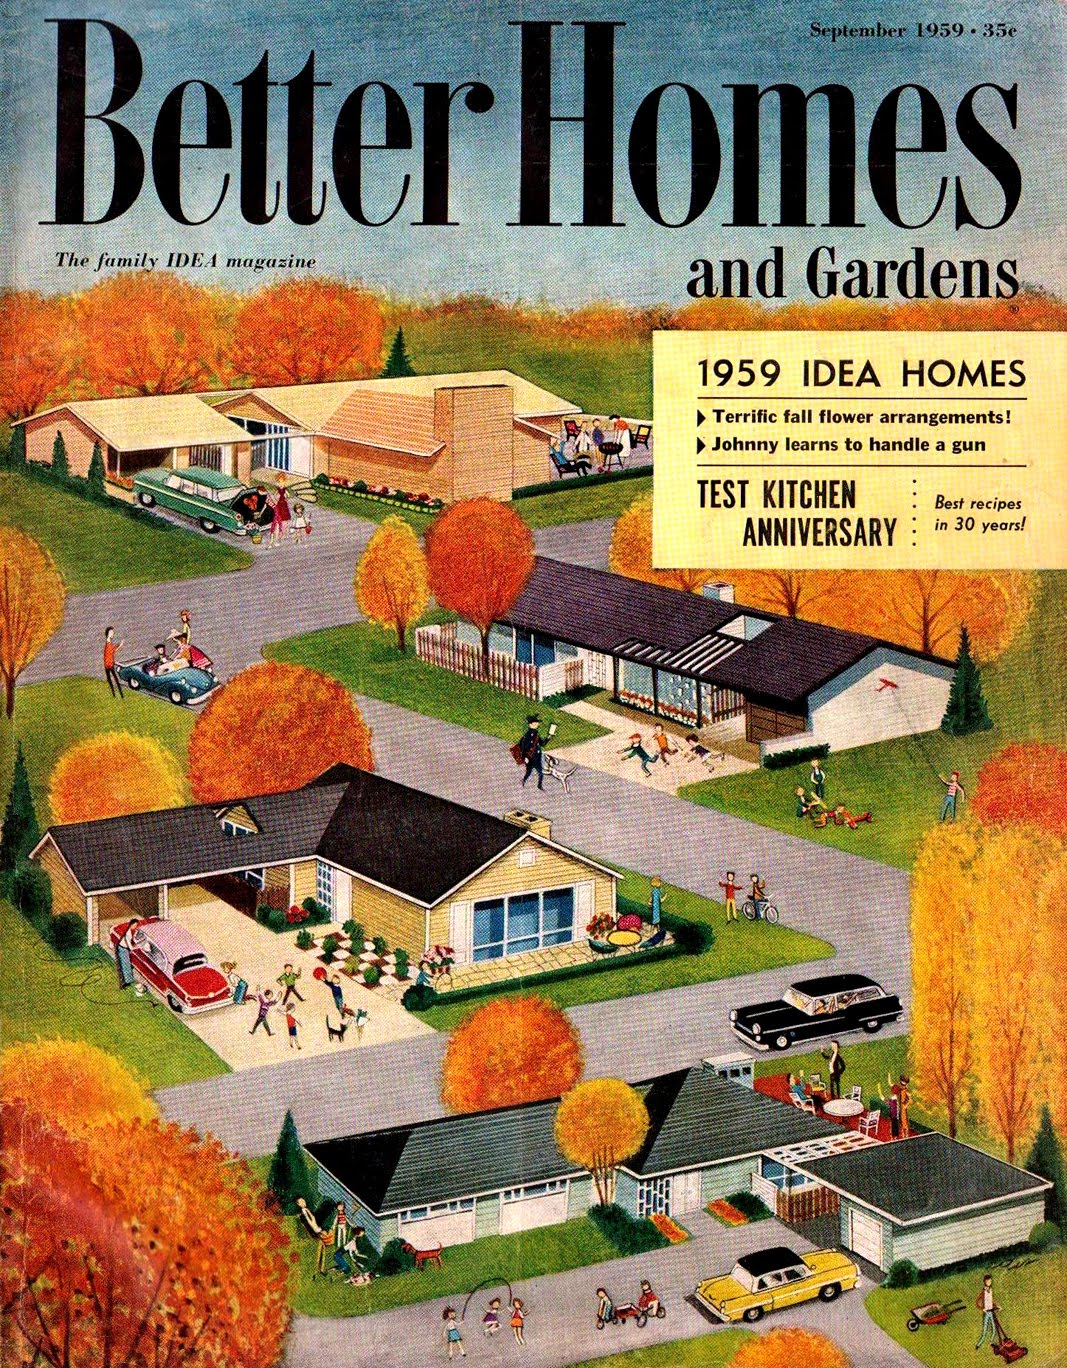 better homes and gardens wallpaper wallpapersafari. Black Bedroom Furniture Sets. Home Design Ideas